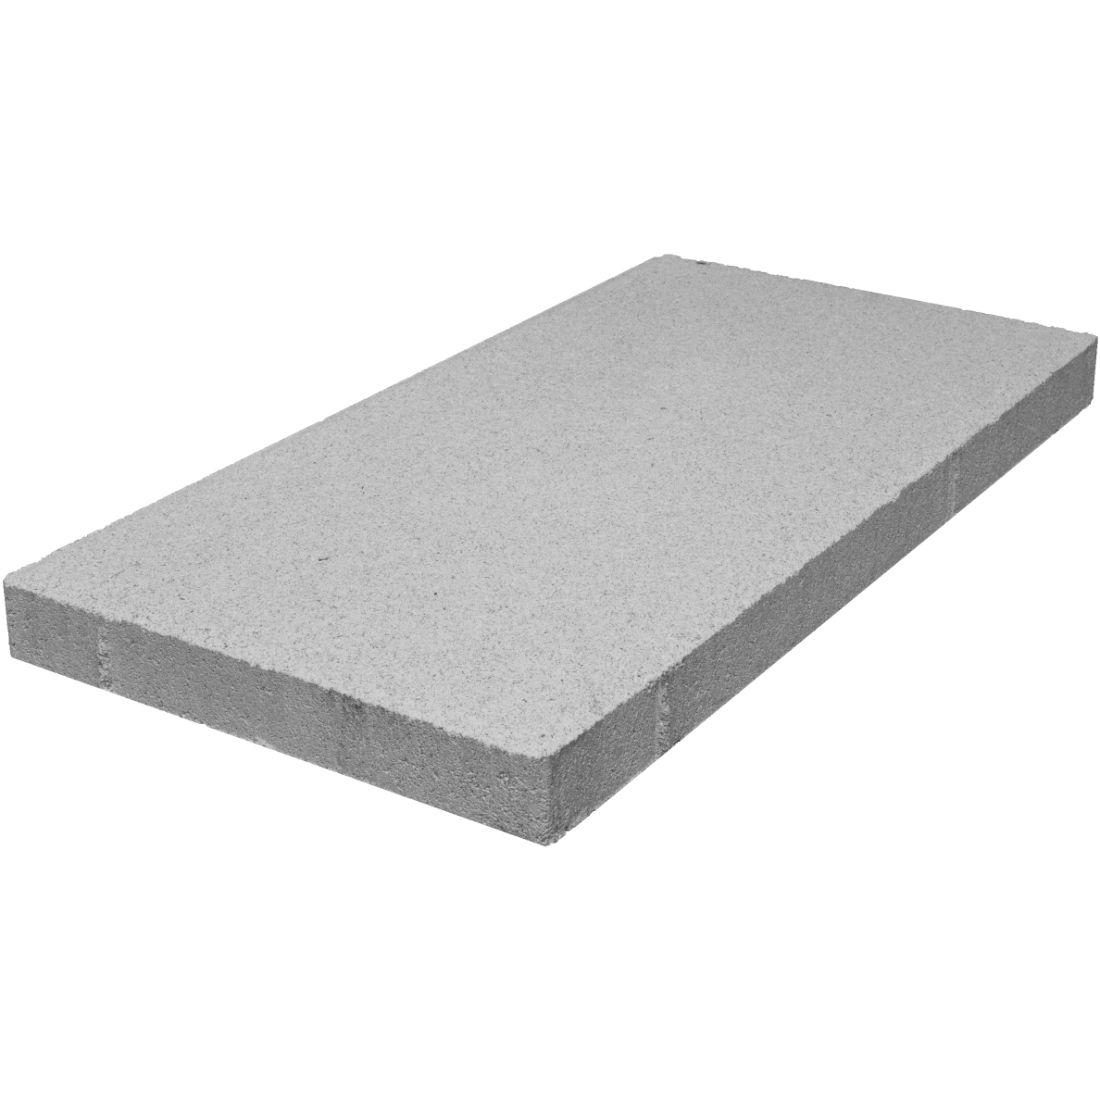 Patio Concrete Paver 542 x 270 x 40mm Ironsand